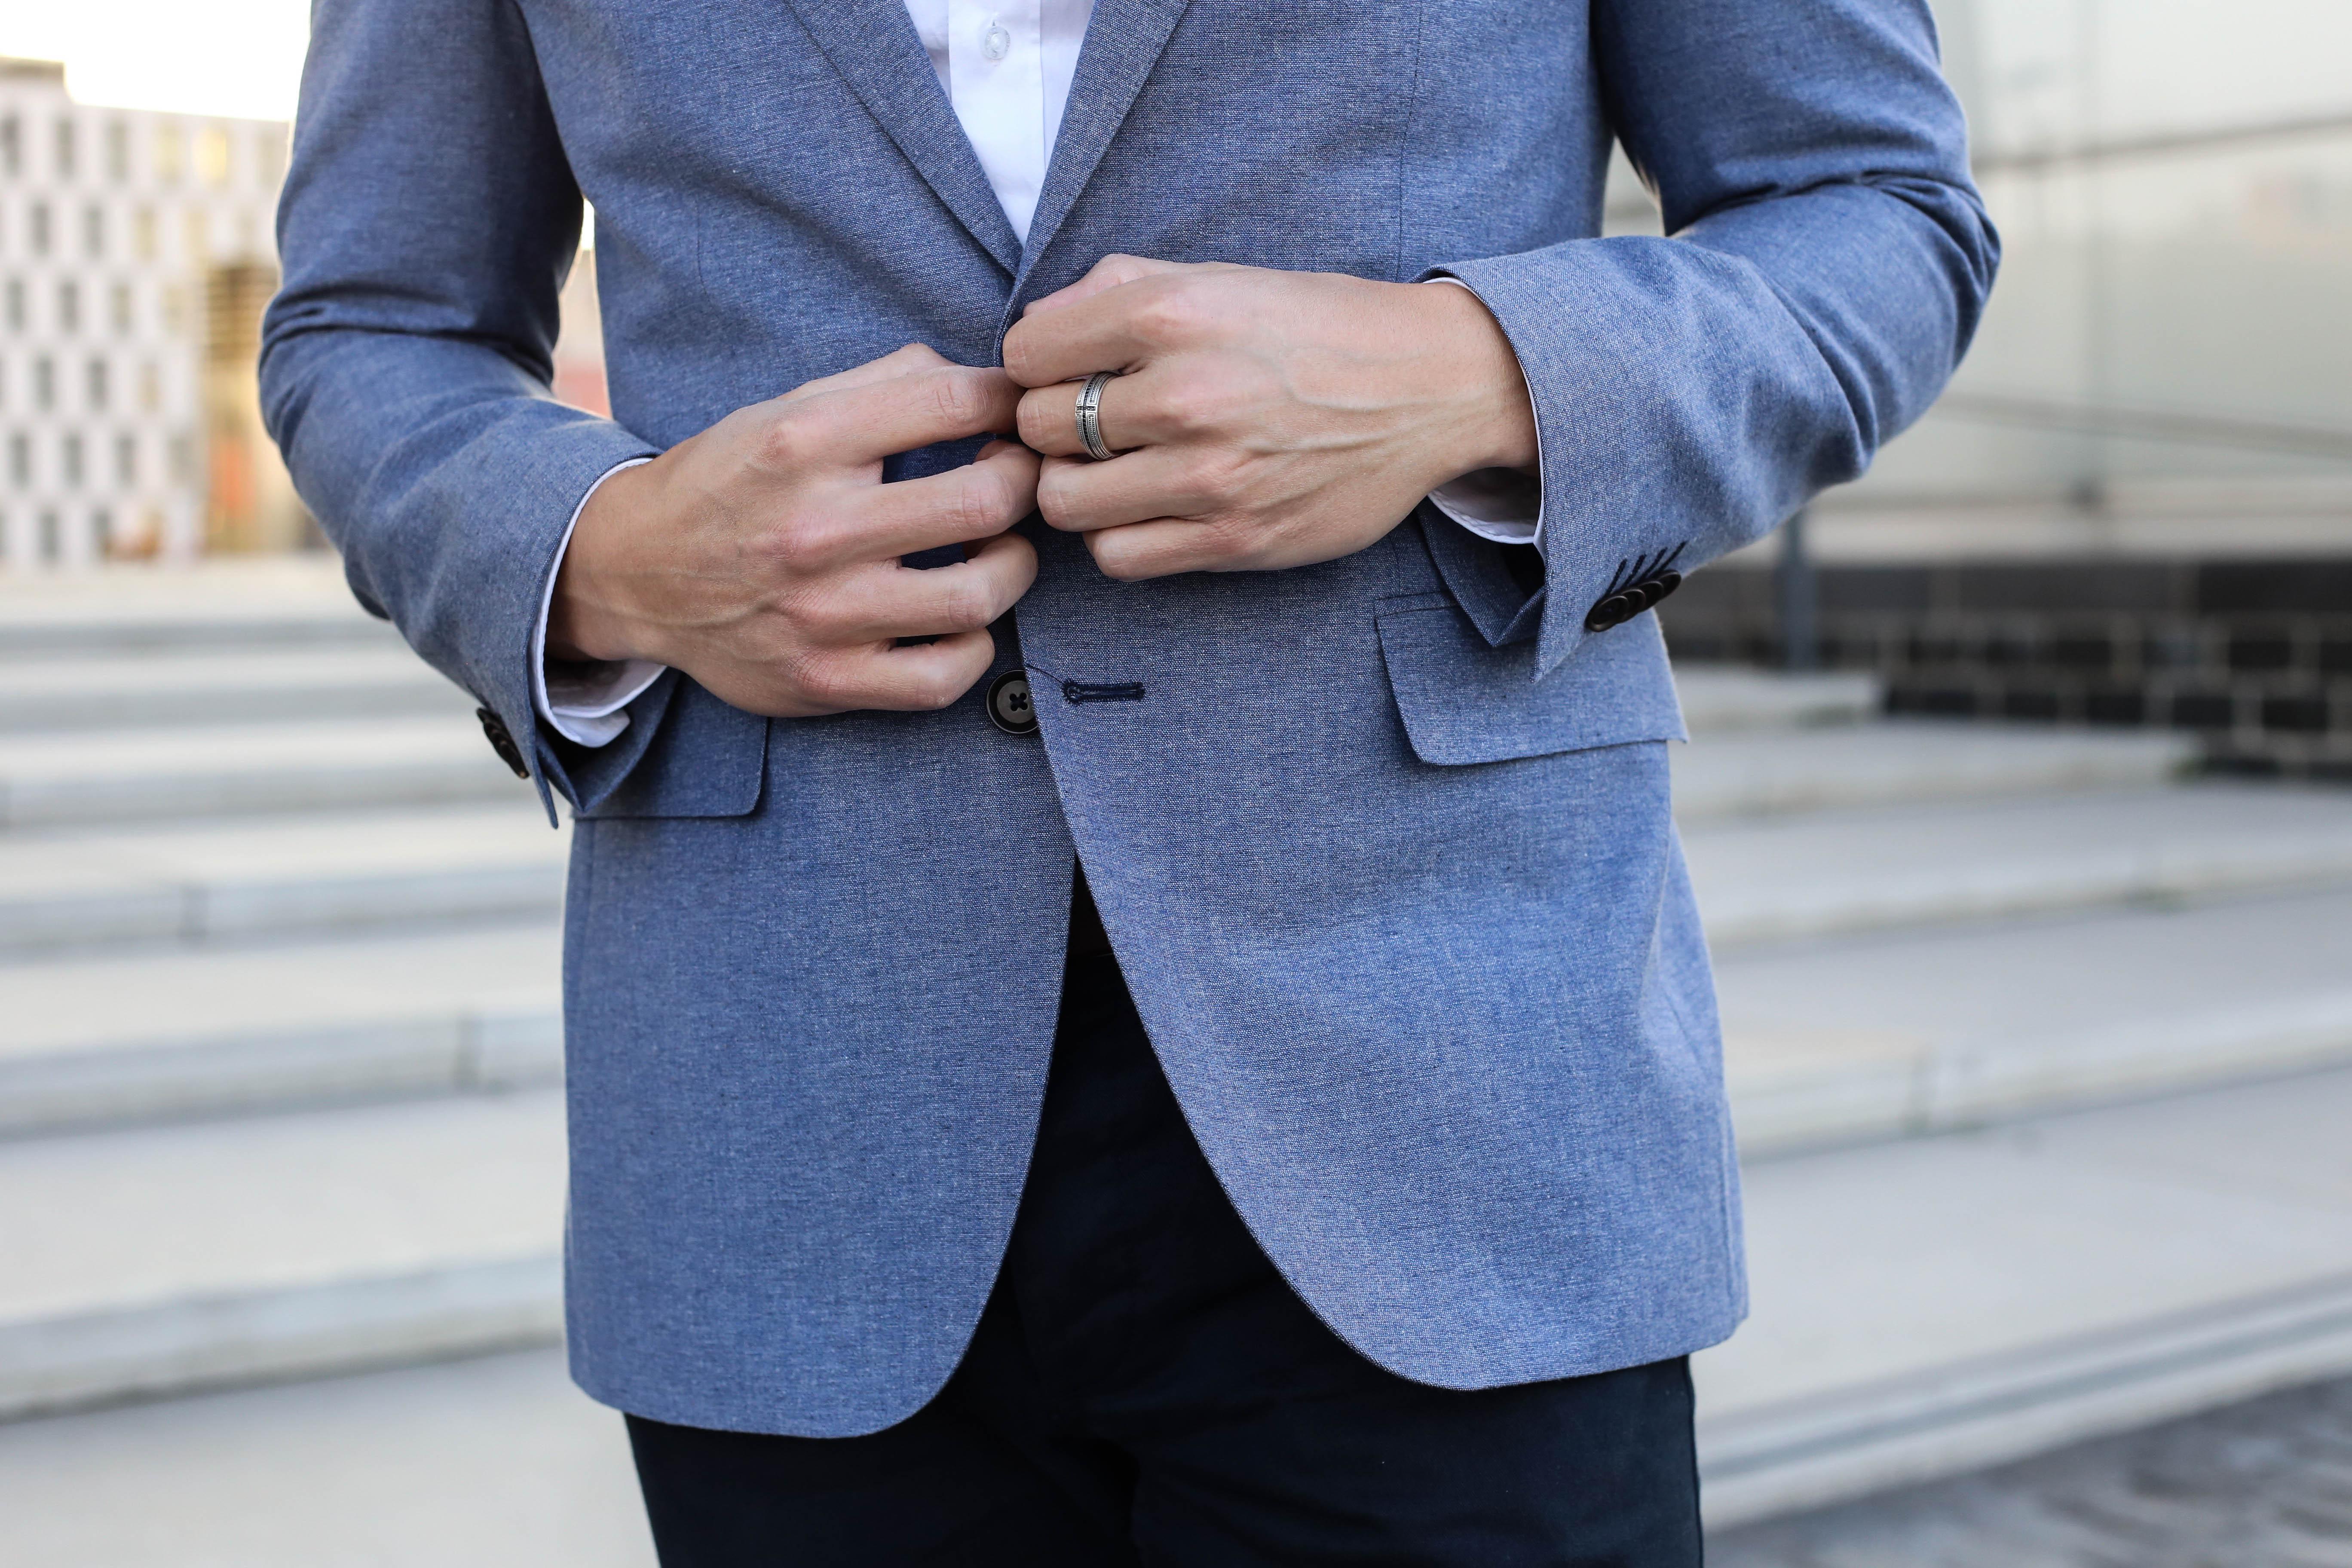 hellblaues-sakko-smart-casual-look-menfashion-fashionblog-berlin_7894